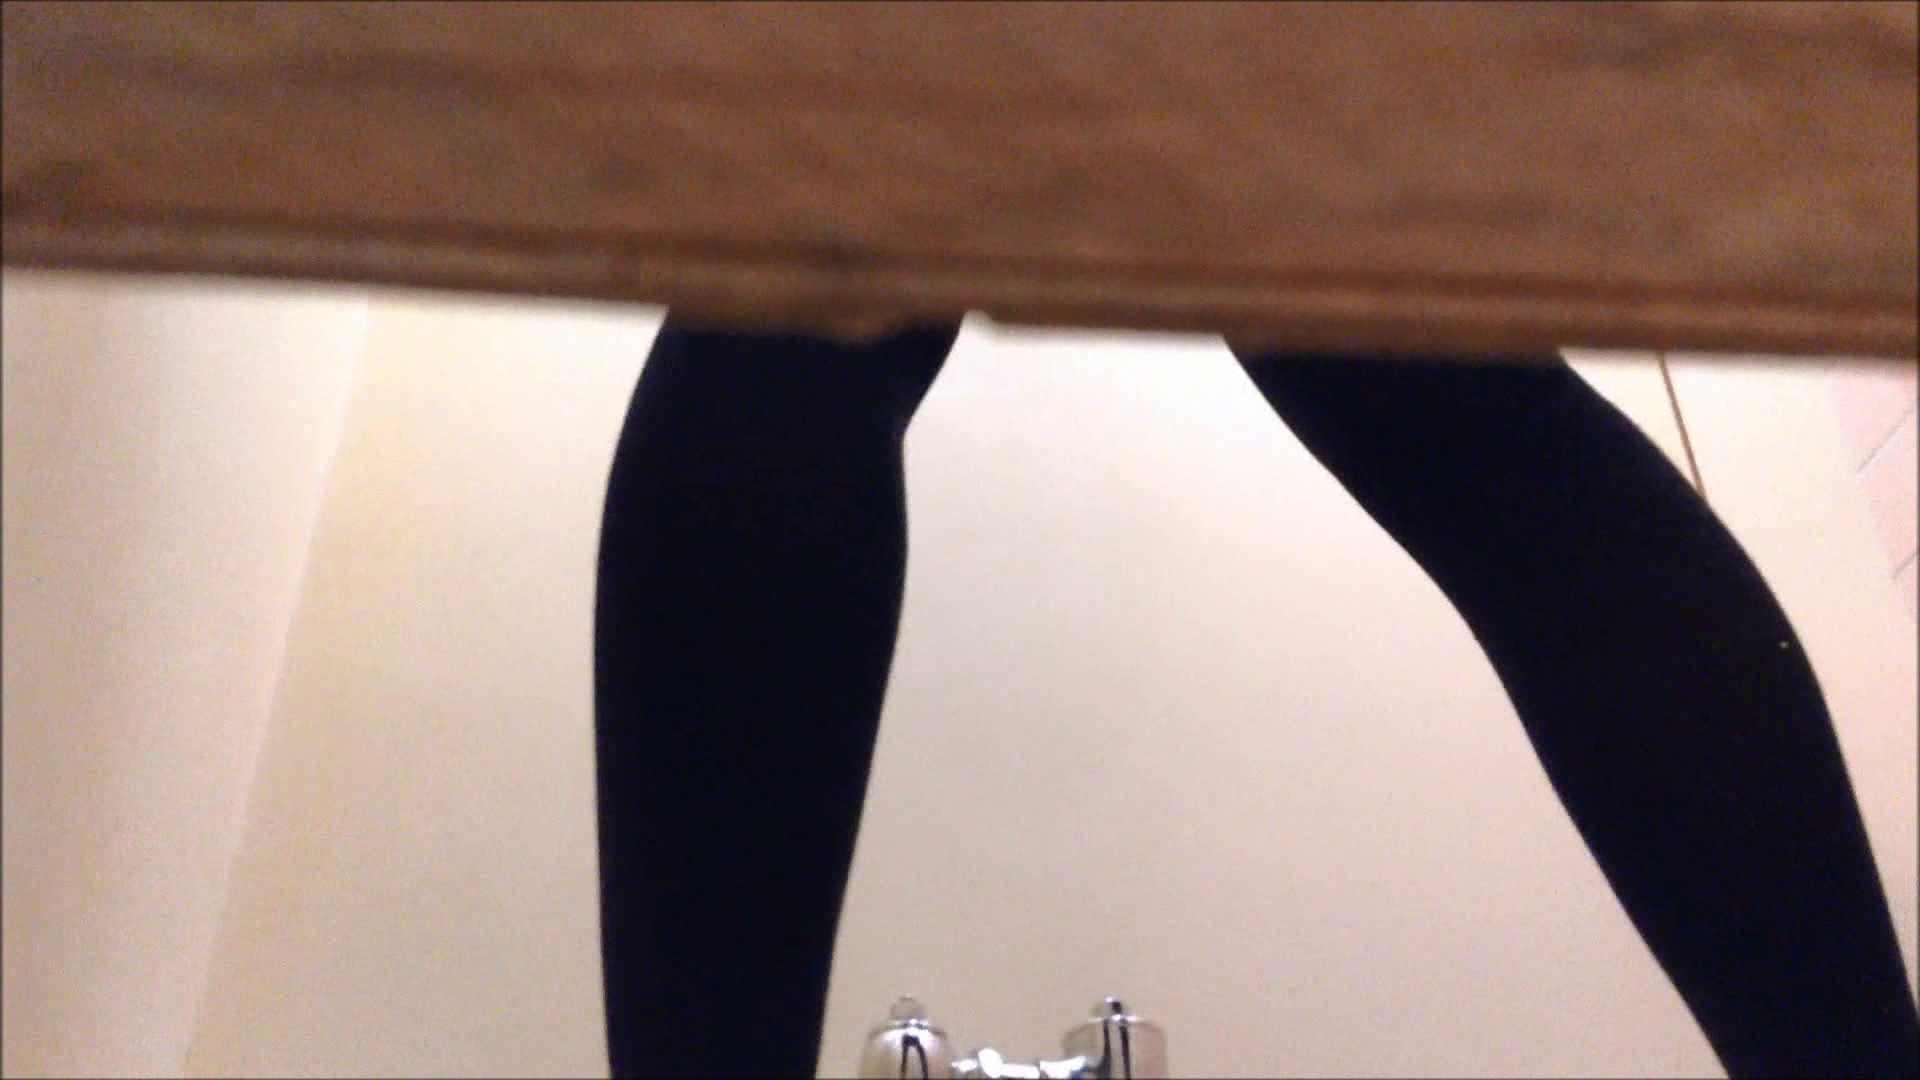 某有名大学女性洗面所 vol.14 丸見え おめこ無修正動画無料 87枚 27